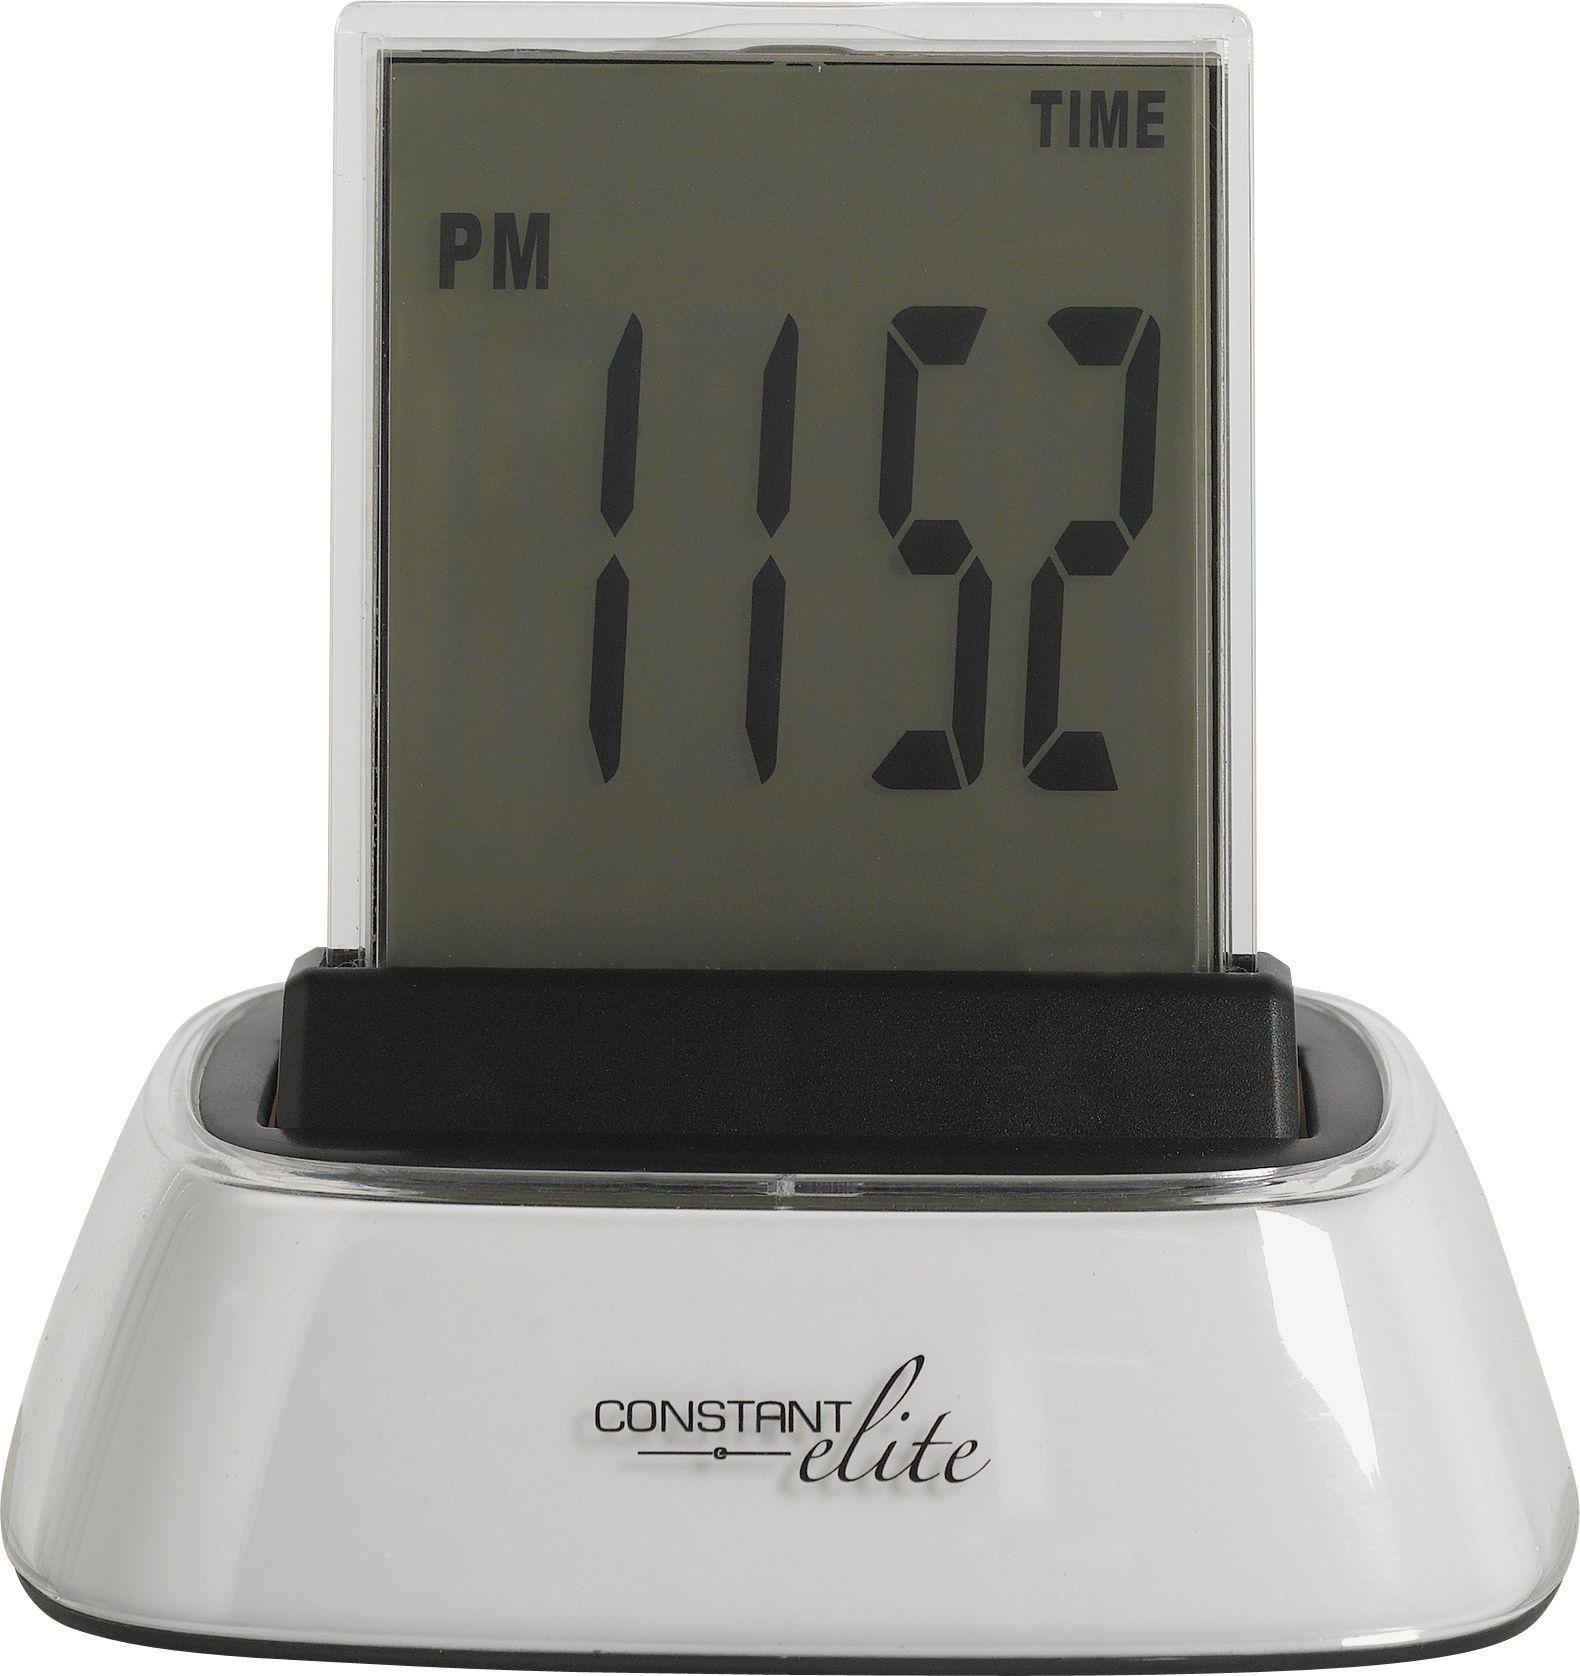 Image of Constant Elite Colour Change LCD Alarm Clock